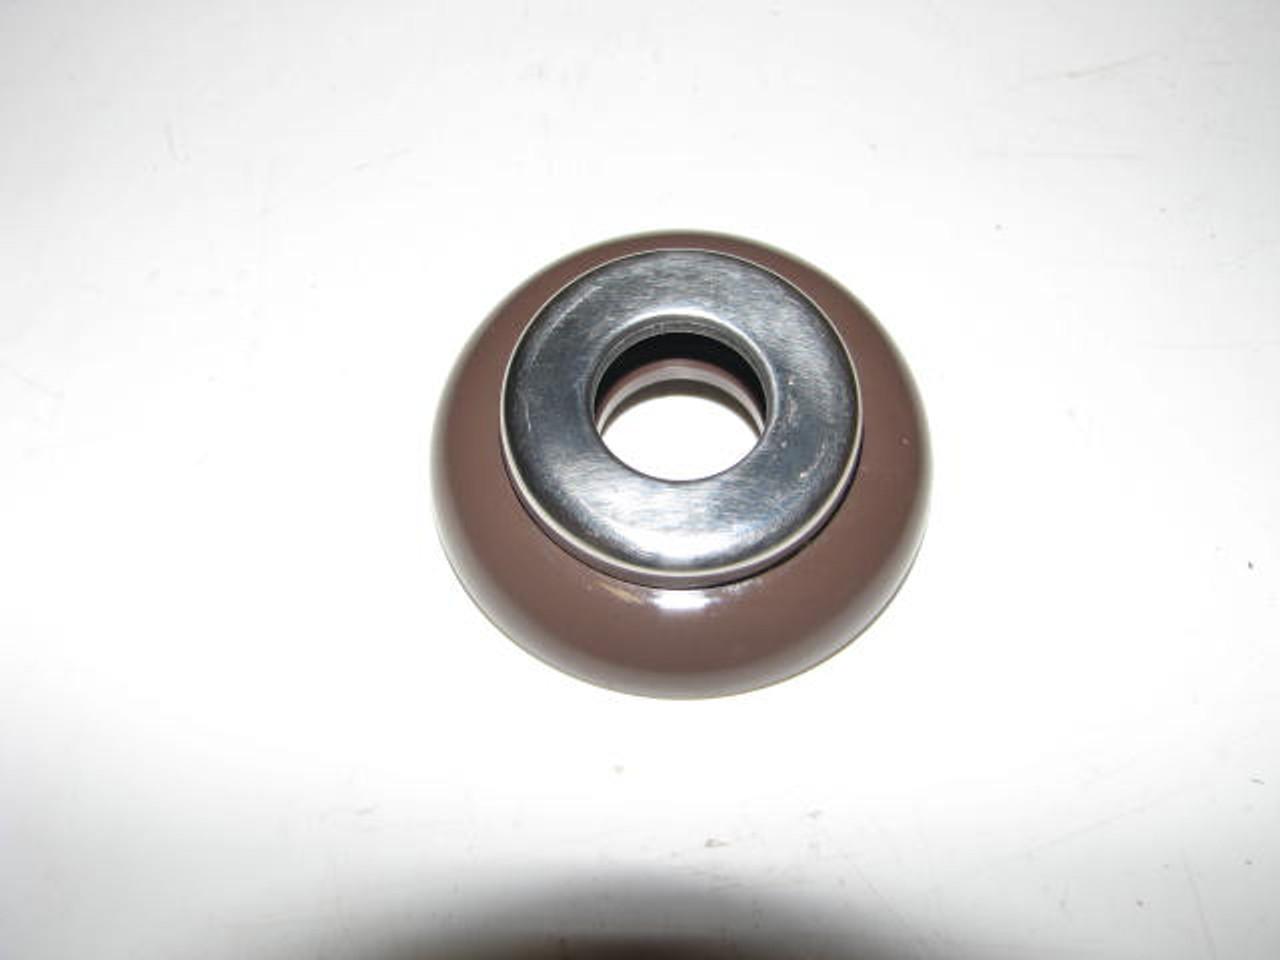 Spartan Window Handle Escutcheon - Chocolate Brown (CHW102)